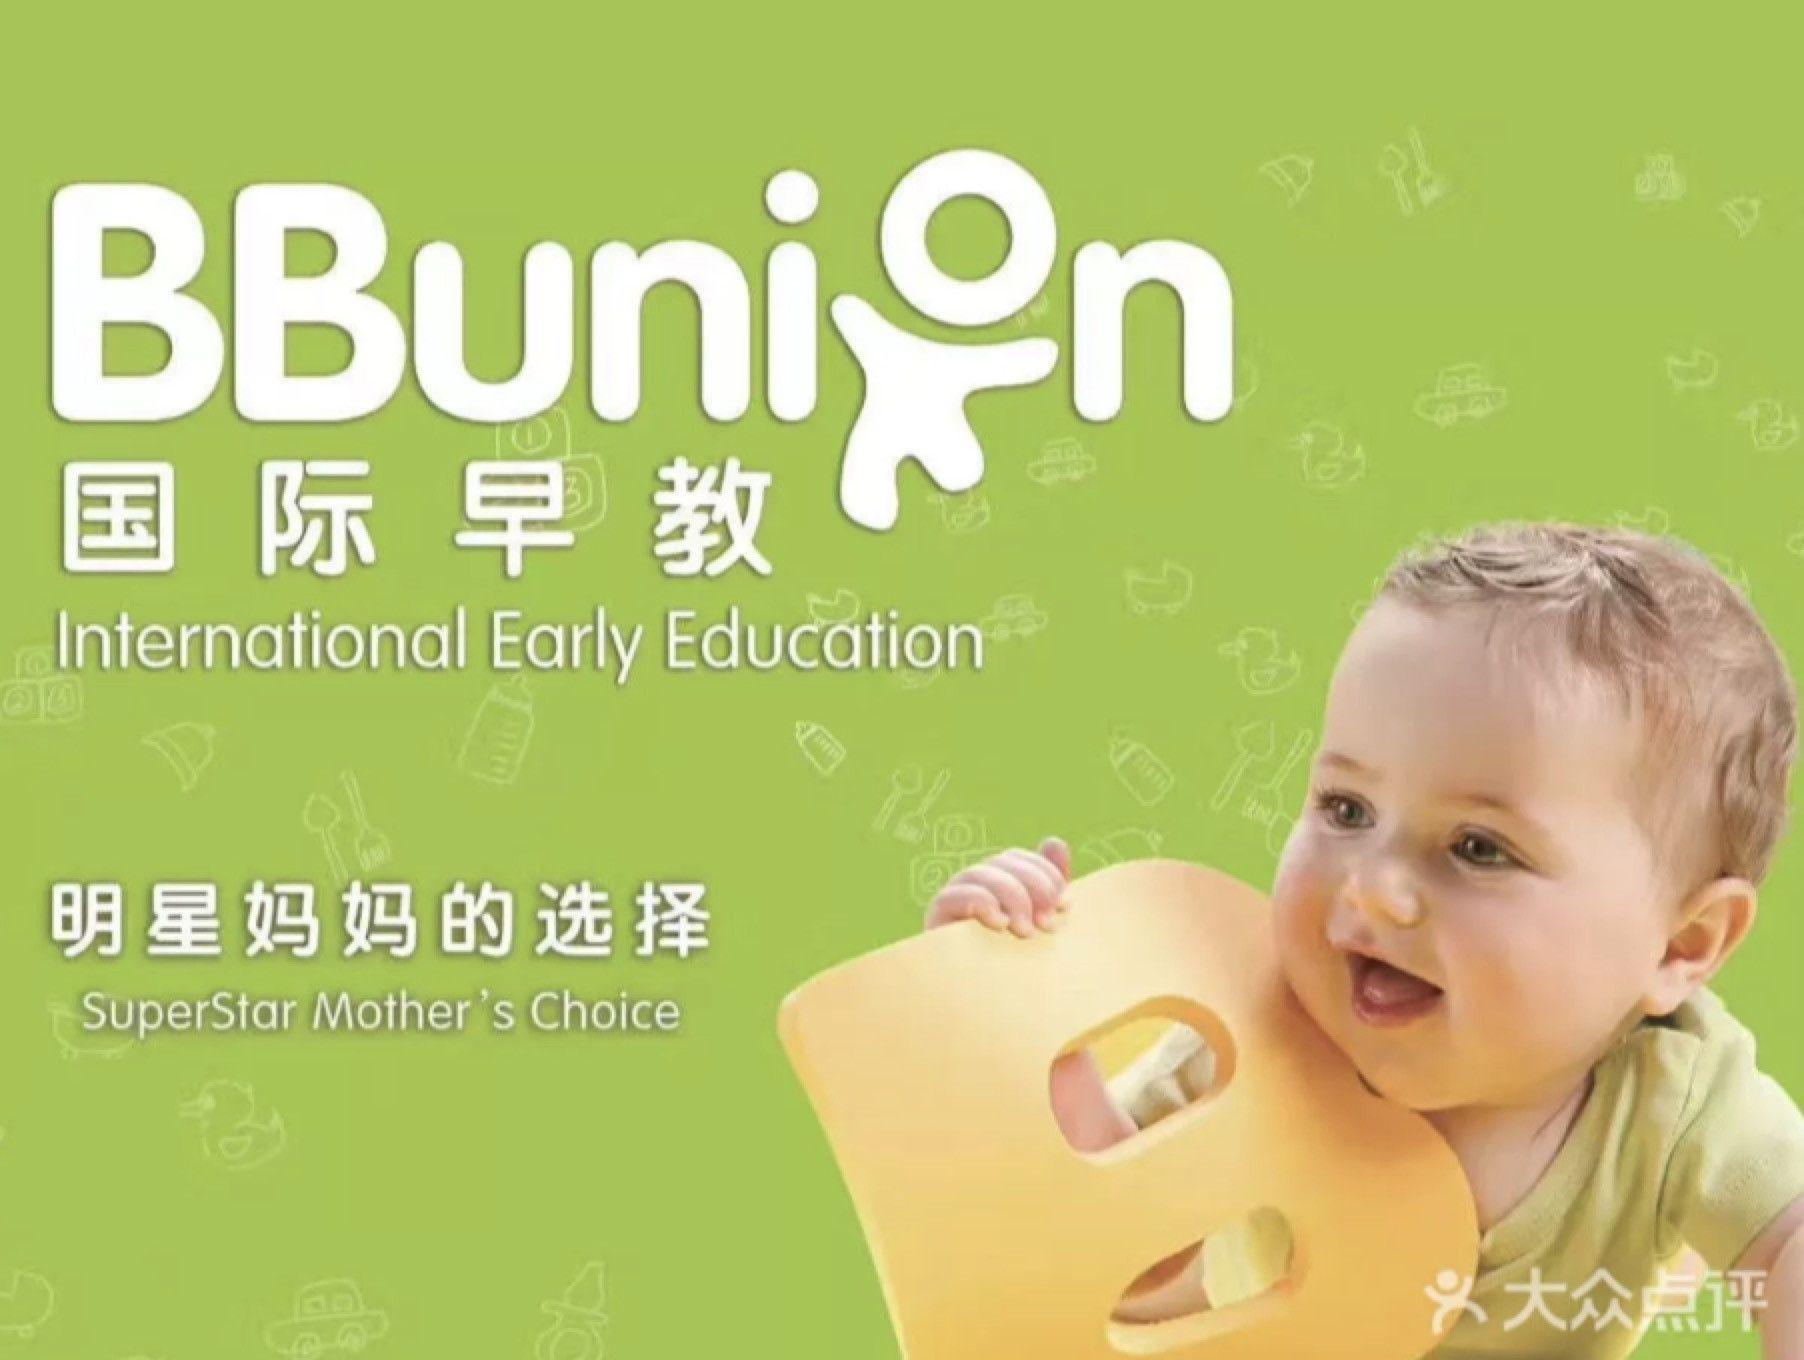 BBunion国际早教(张家港中心)